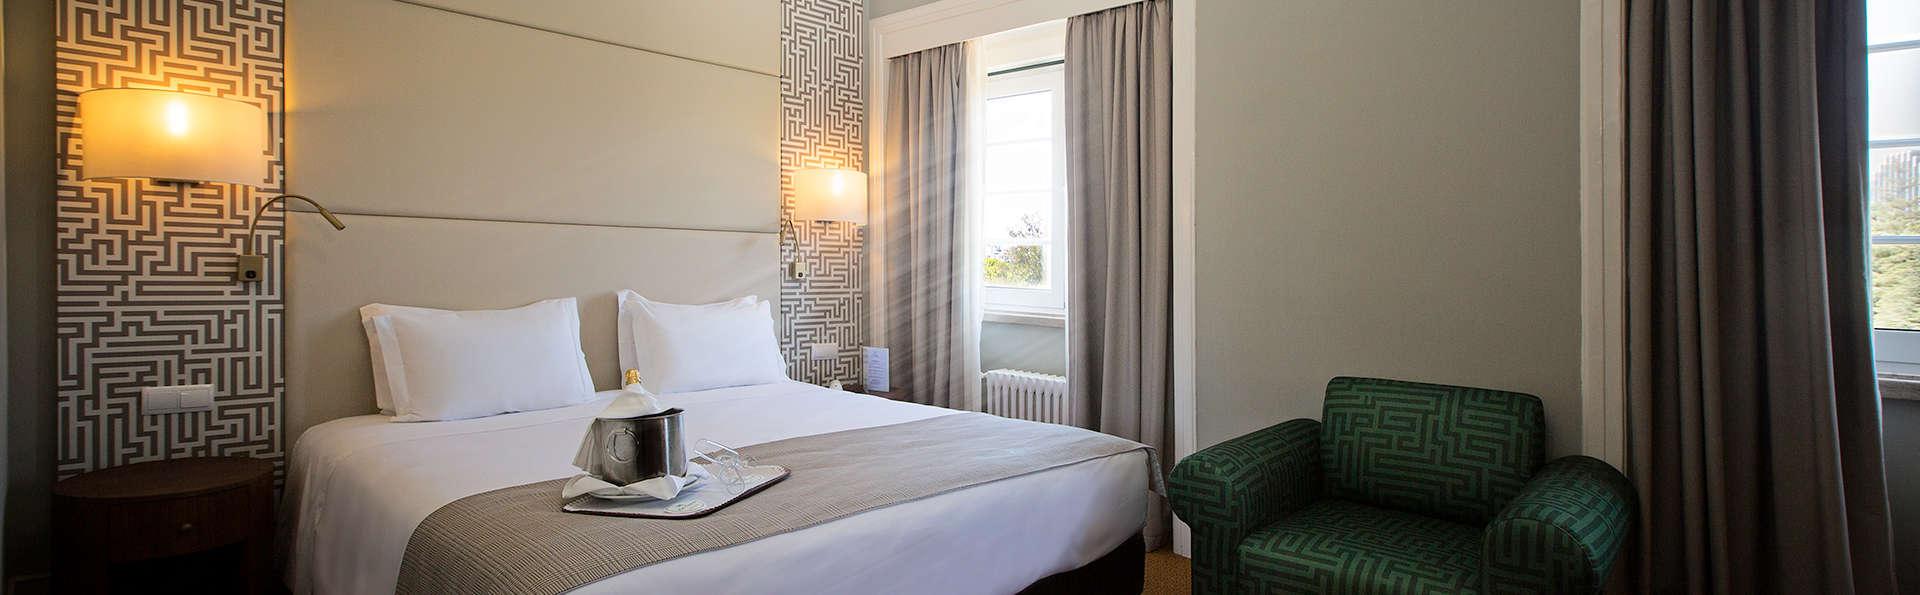 Hotel Miraparque - EDIT_room2.jpg